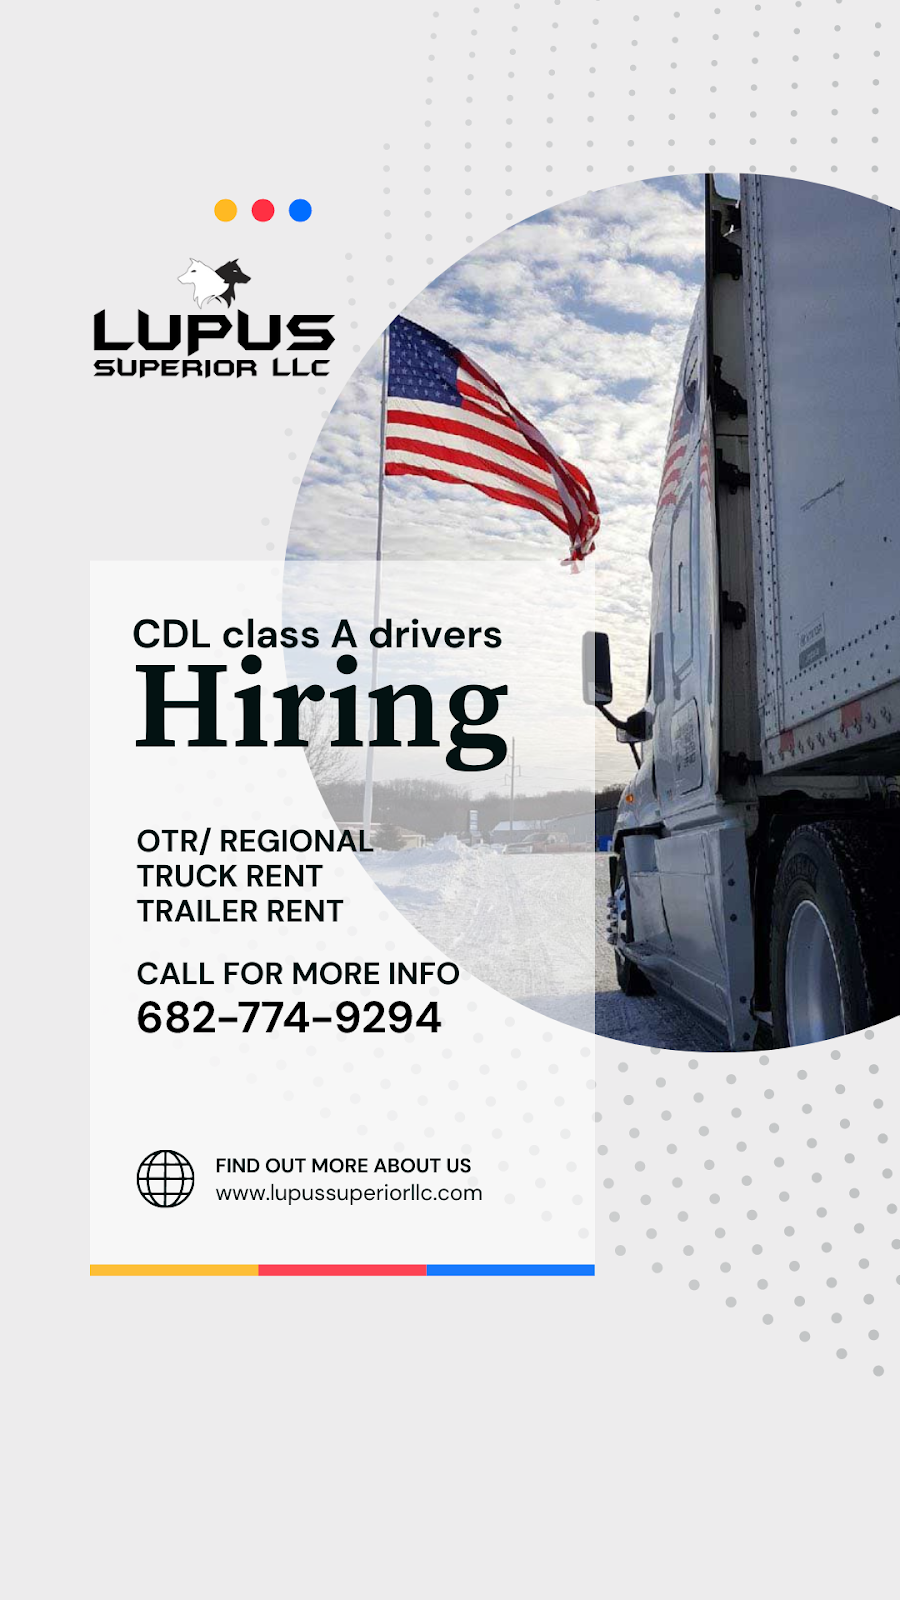 Lupus Superior LLC - moving company  | Photo 9 of 10 | Address: 213 Jere St, Grand Prairie, TX 75050, USA | Phone: (682) 774-9294